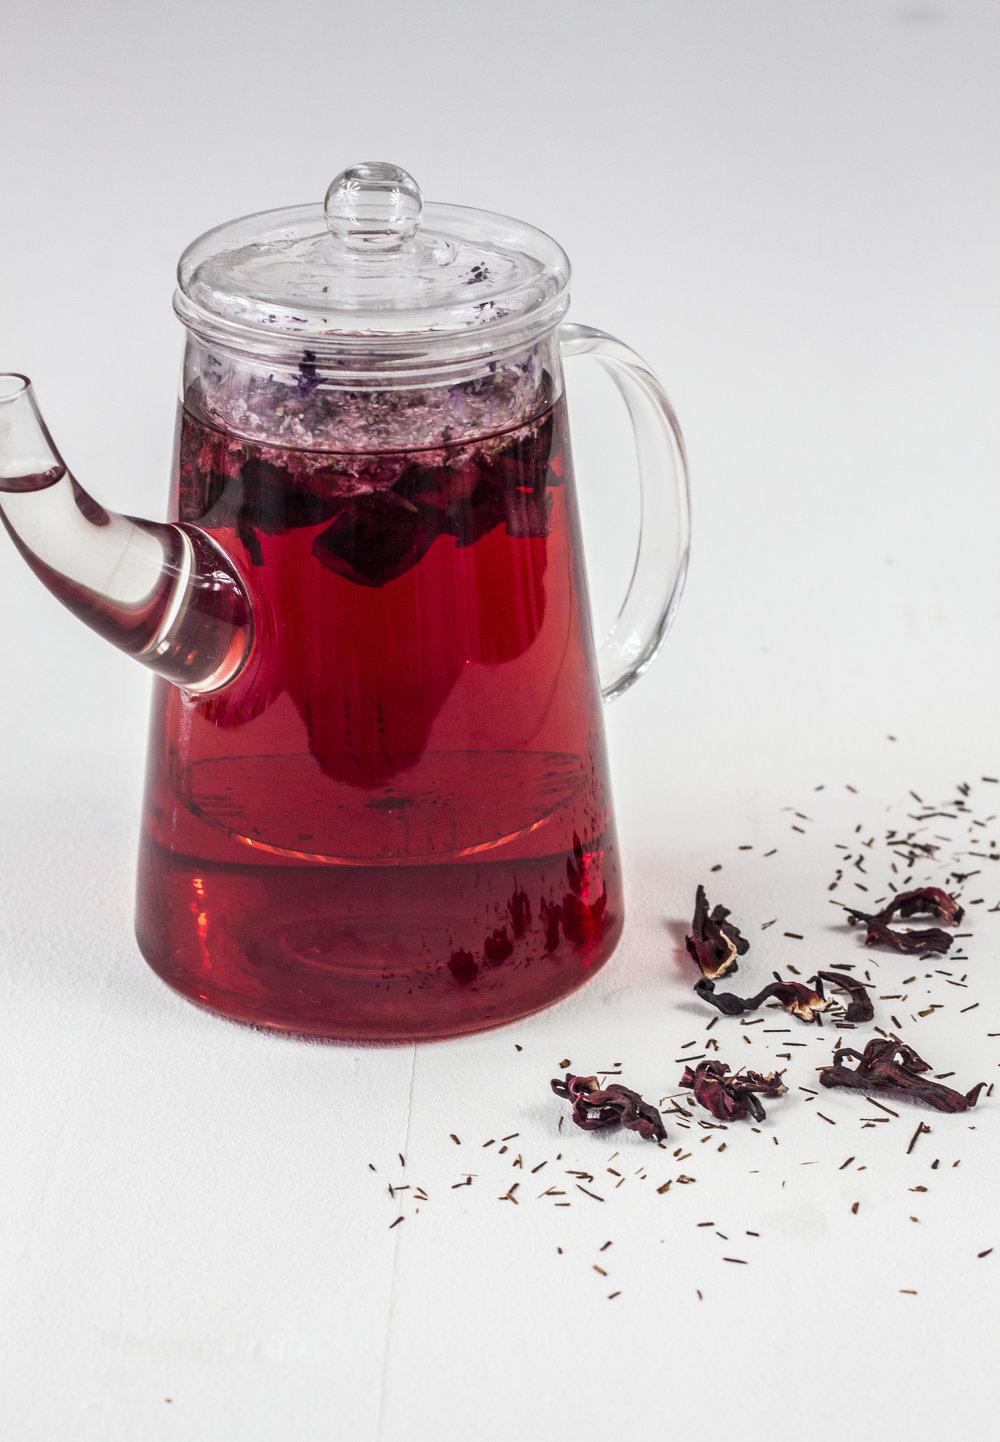 hibiscus gloegg opskrift recipe skin food